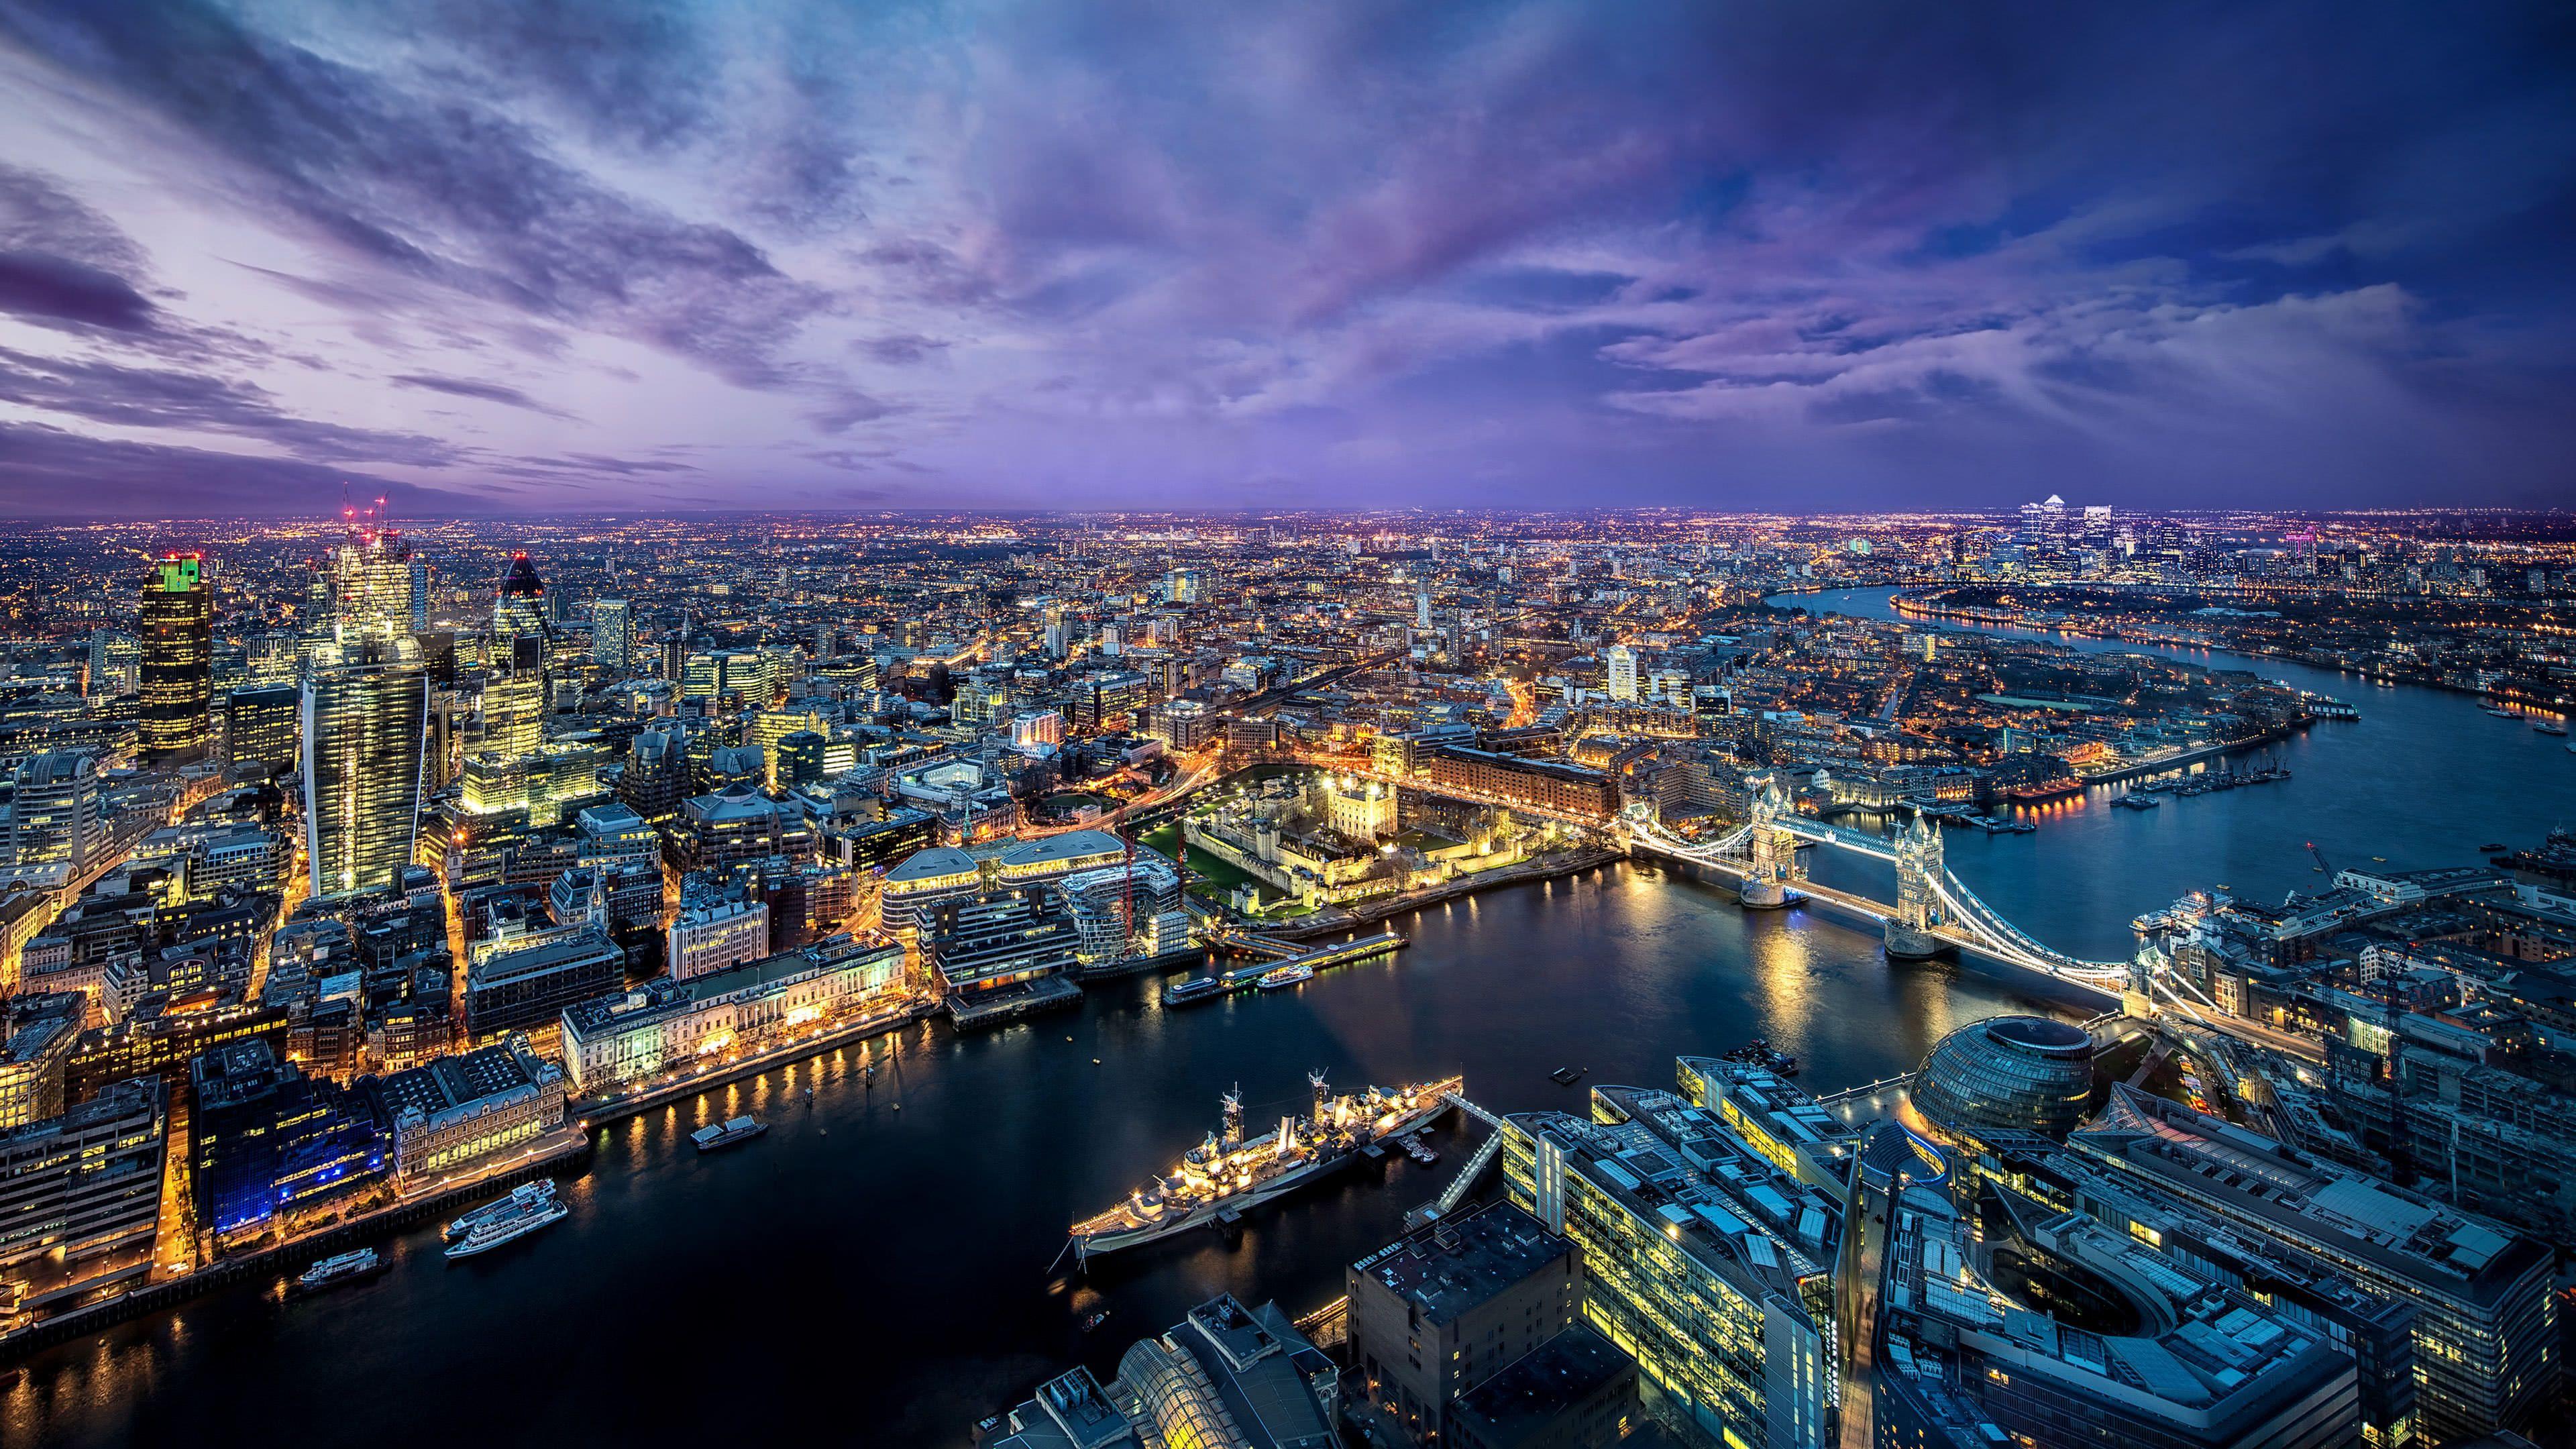 Mobile And Desktop Wallpaper Hd London Wallpaper London Night London City